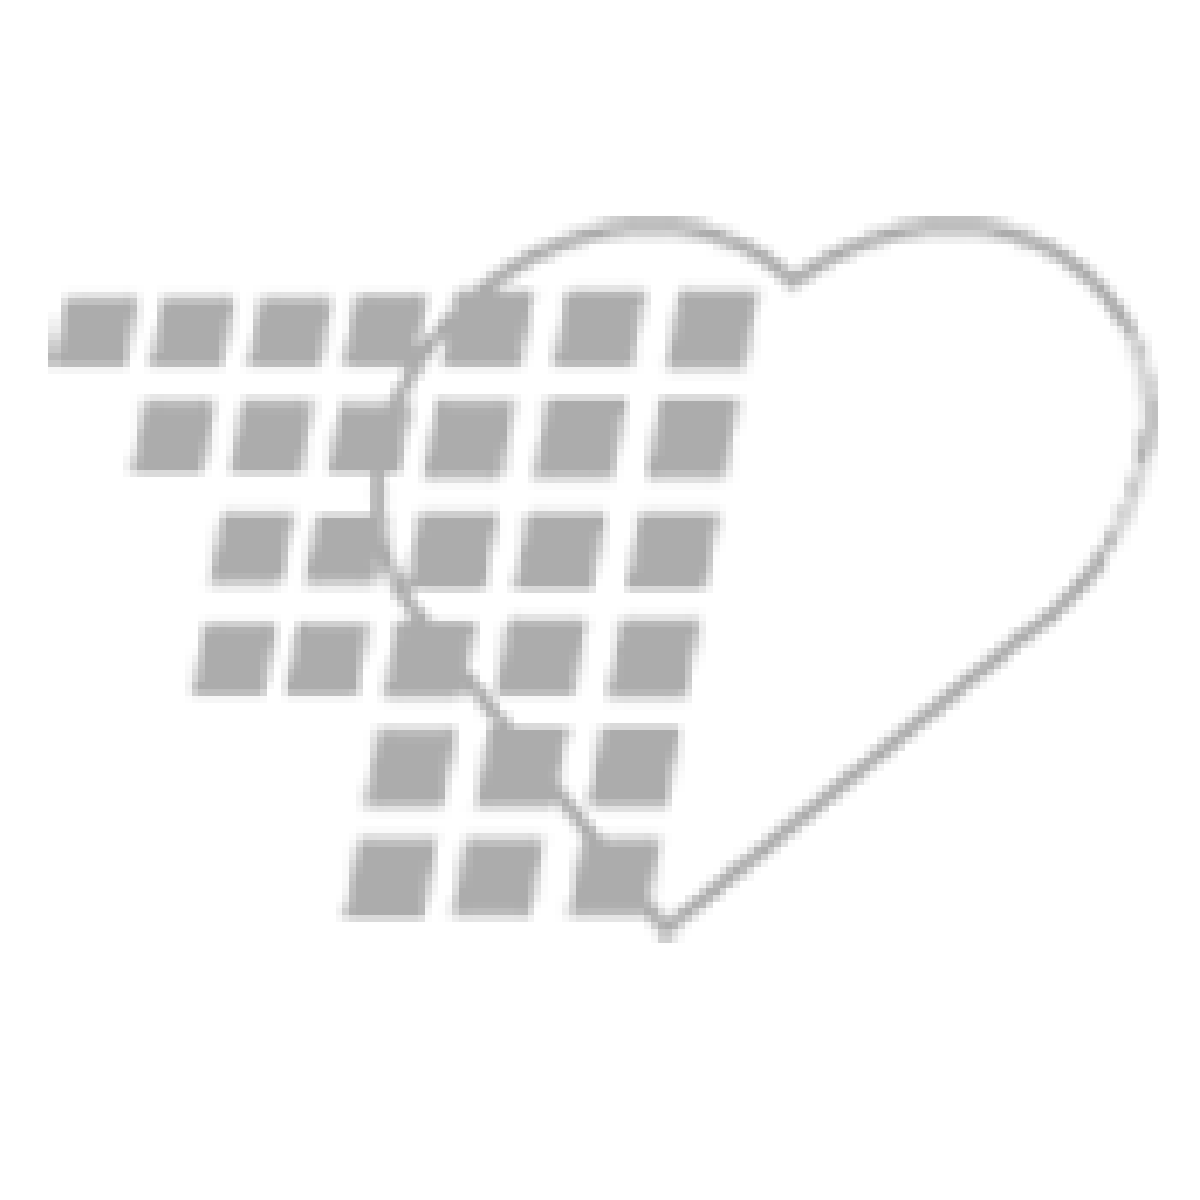 06-93-1111 Demo Dose® Simulated Code Drug Set #1